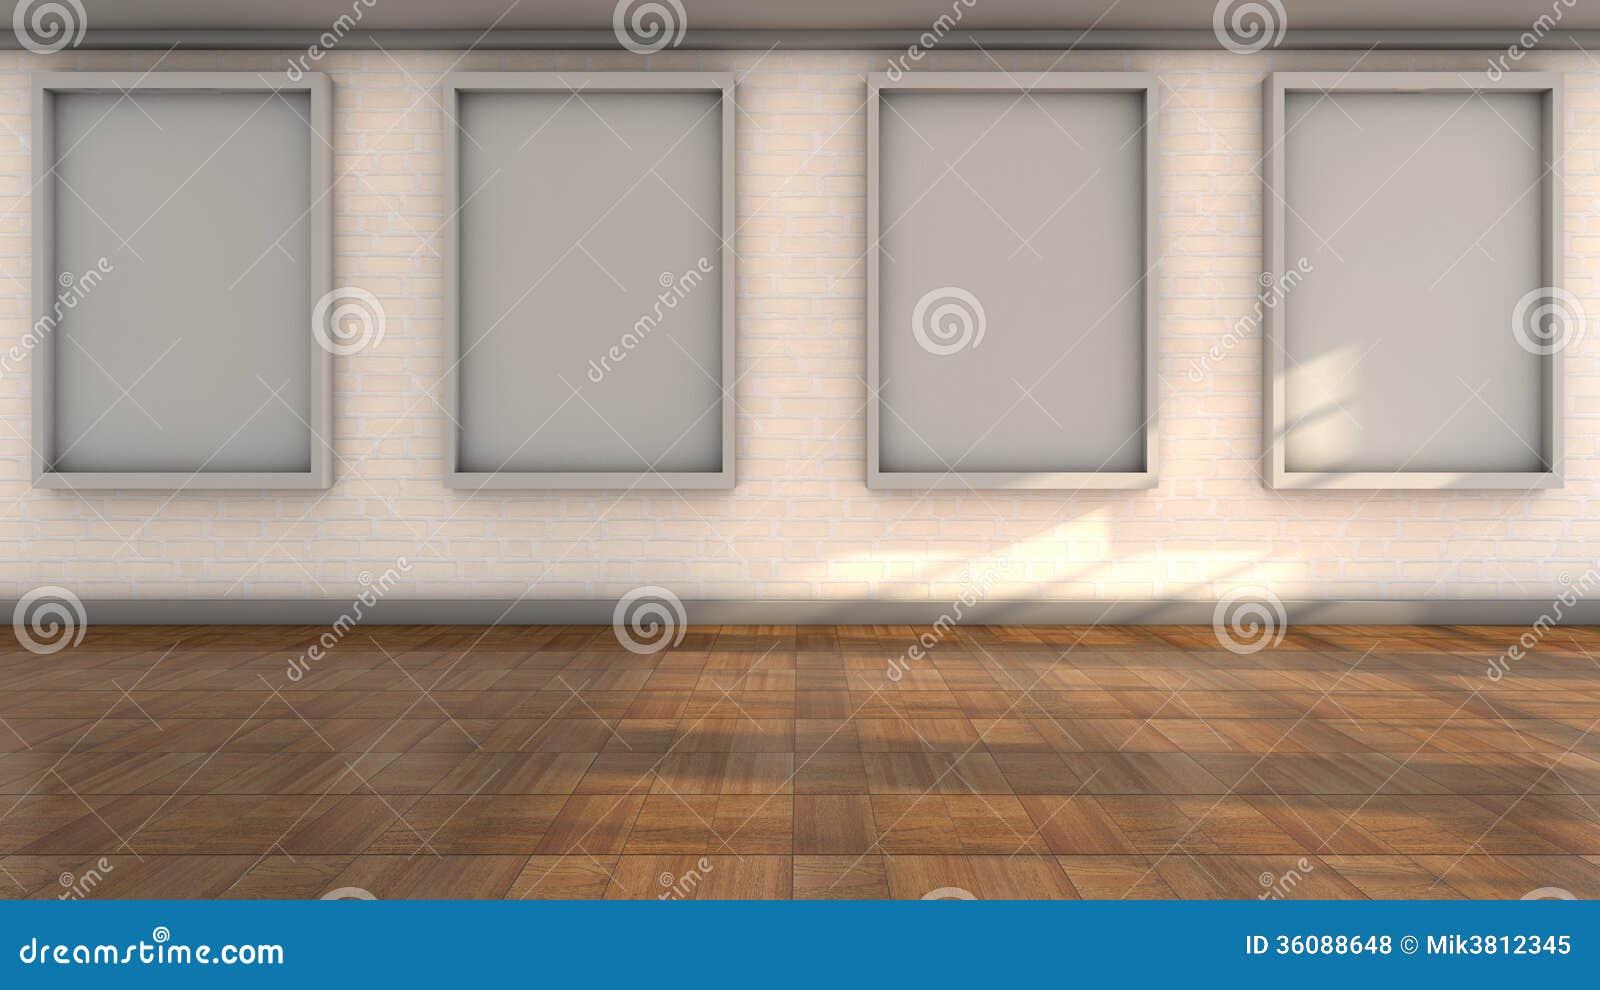 interior design wall royalty free stock photos - image: 36088648